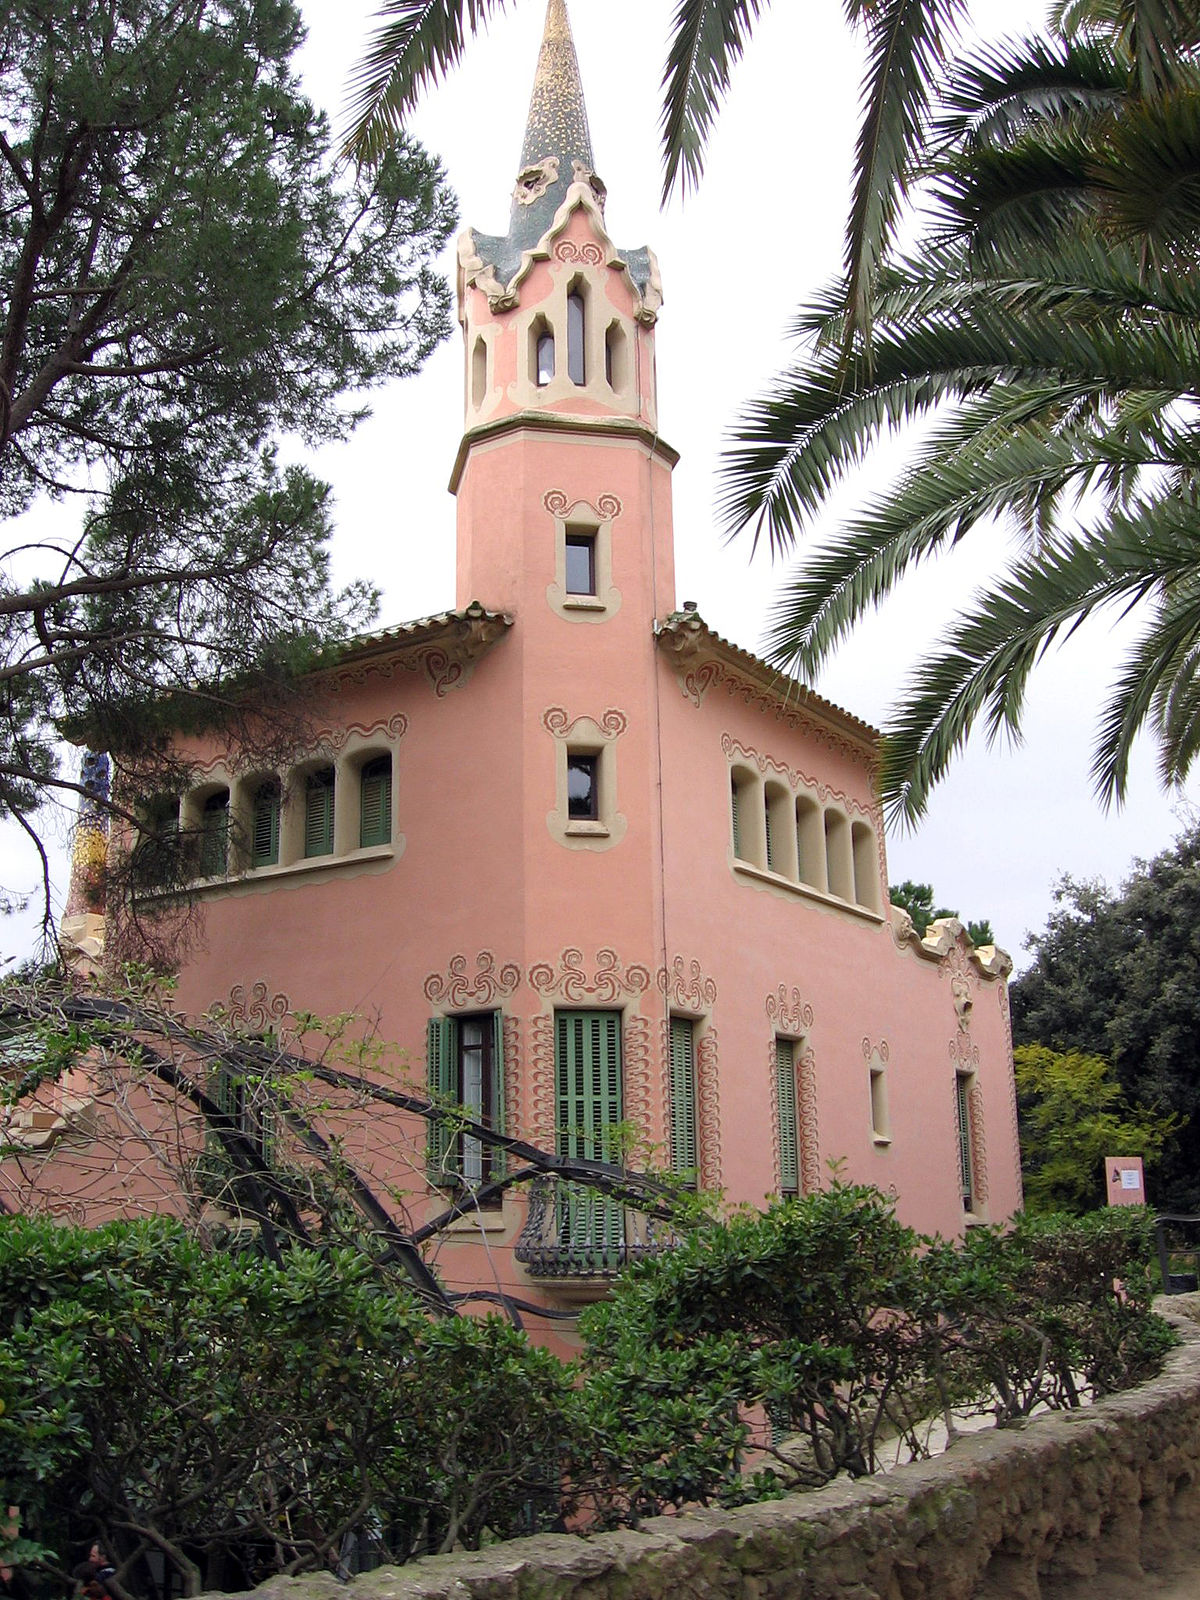 Gaudijeva arhitektura - Page 4 1200px-Park_G%C3%BCell_-_Casa_Museu_Gaud%C3%AD